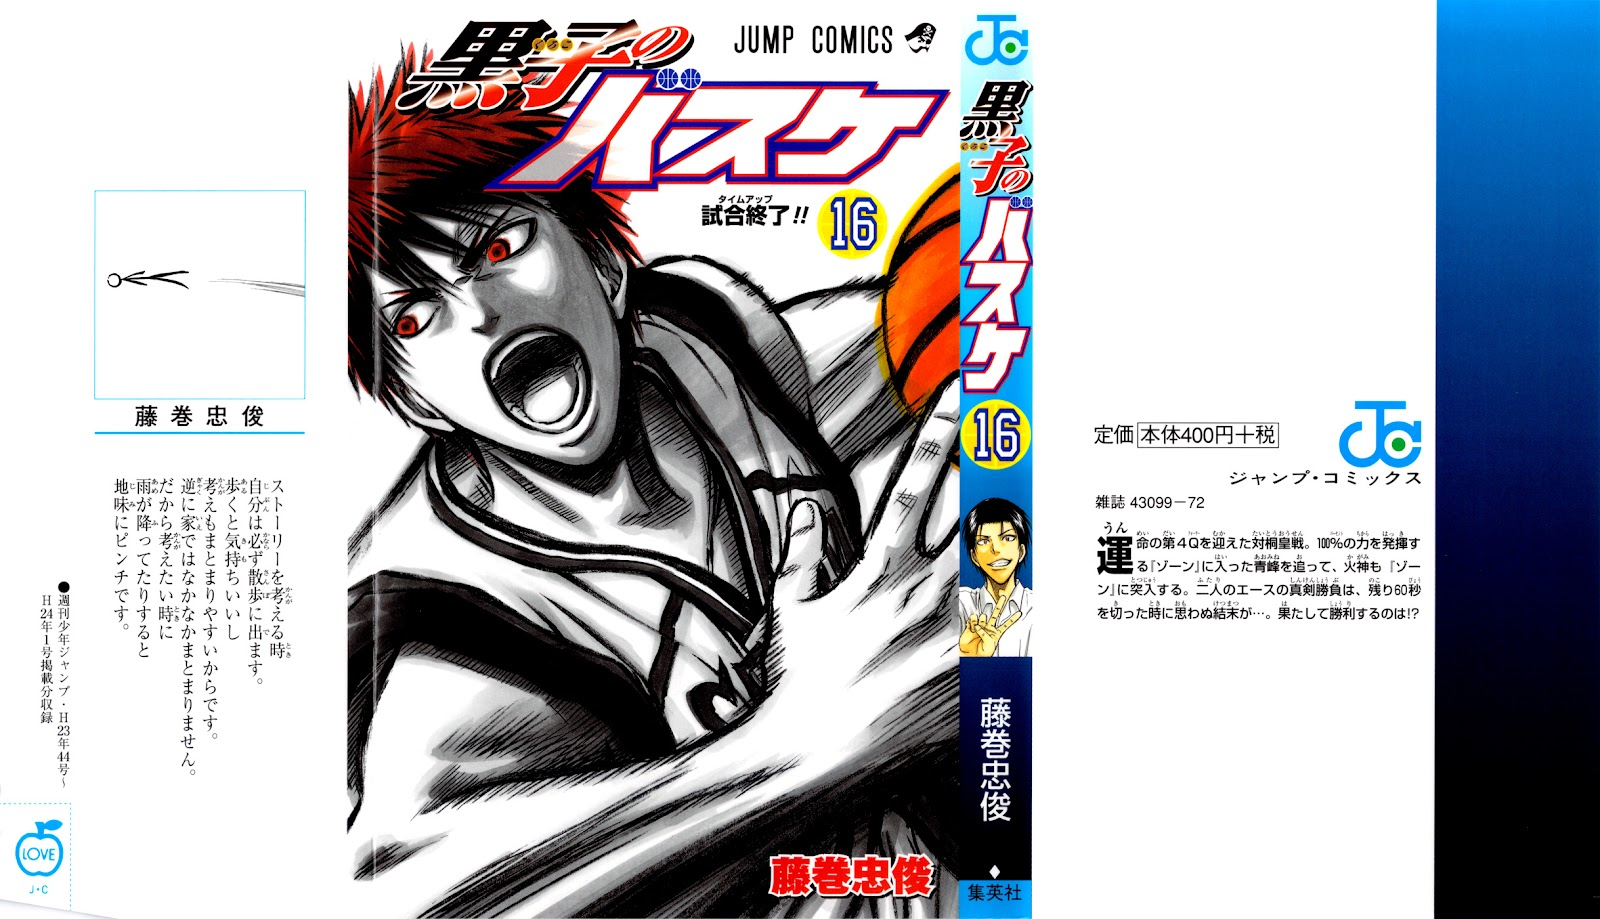 Kuroko no Basket Manga Chapter 136 - Image 1-002